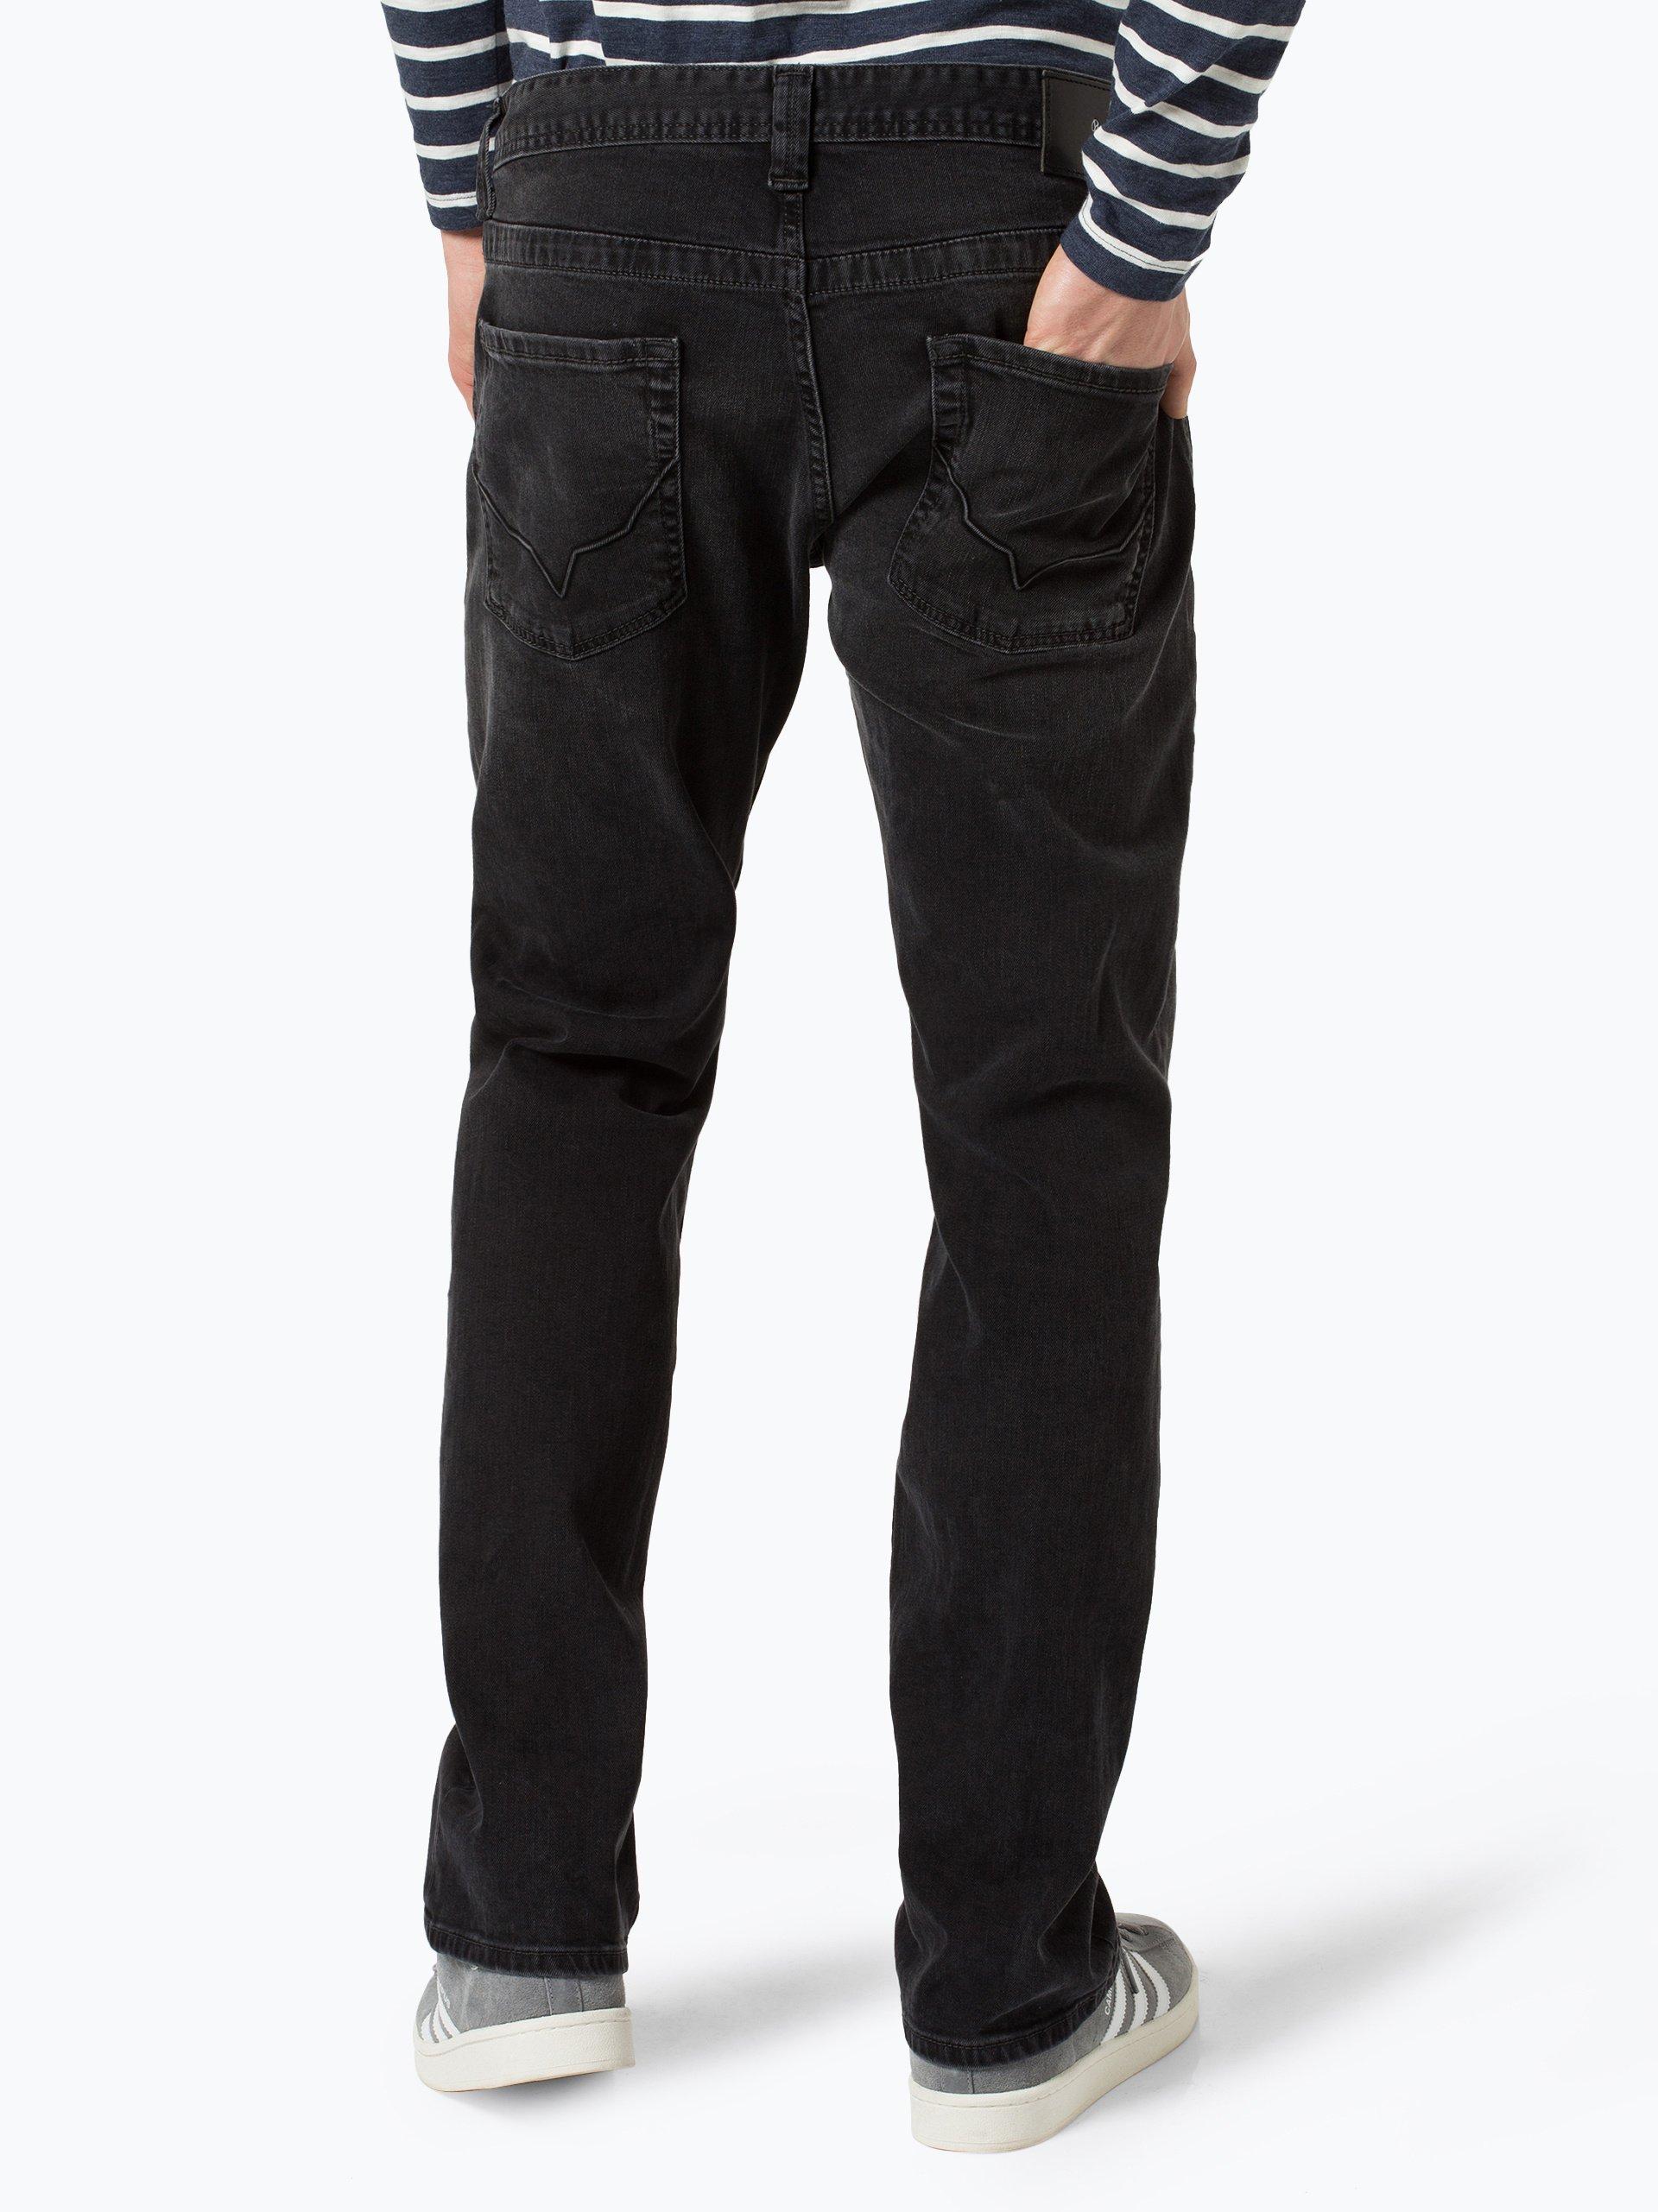 pepe jeans herren jeans kingston schwarz uni online kaufen peek und cloppenburg de. Black Bedroom Furniture Sets. Home Design Ideas